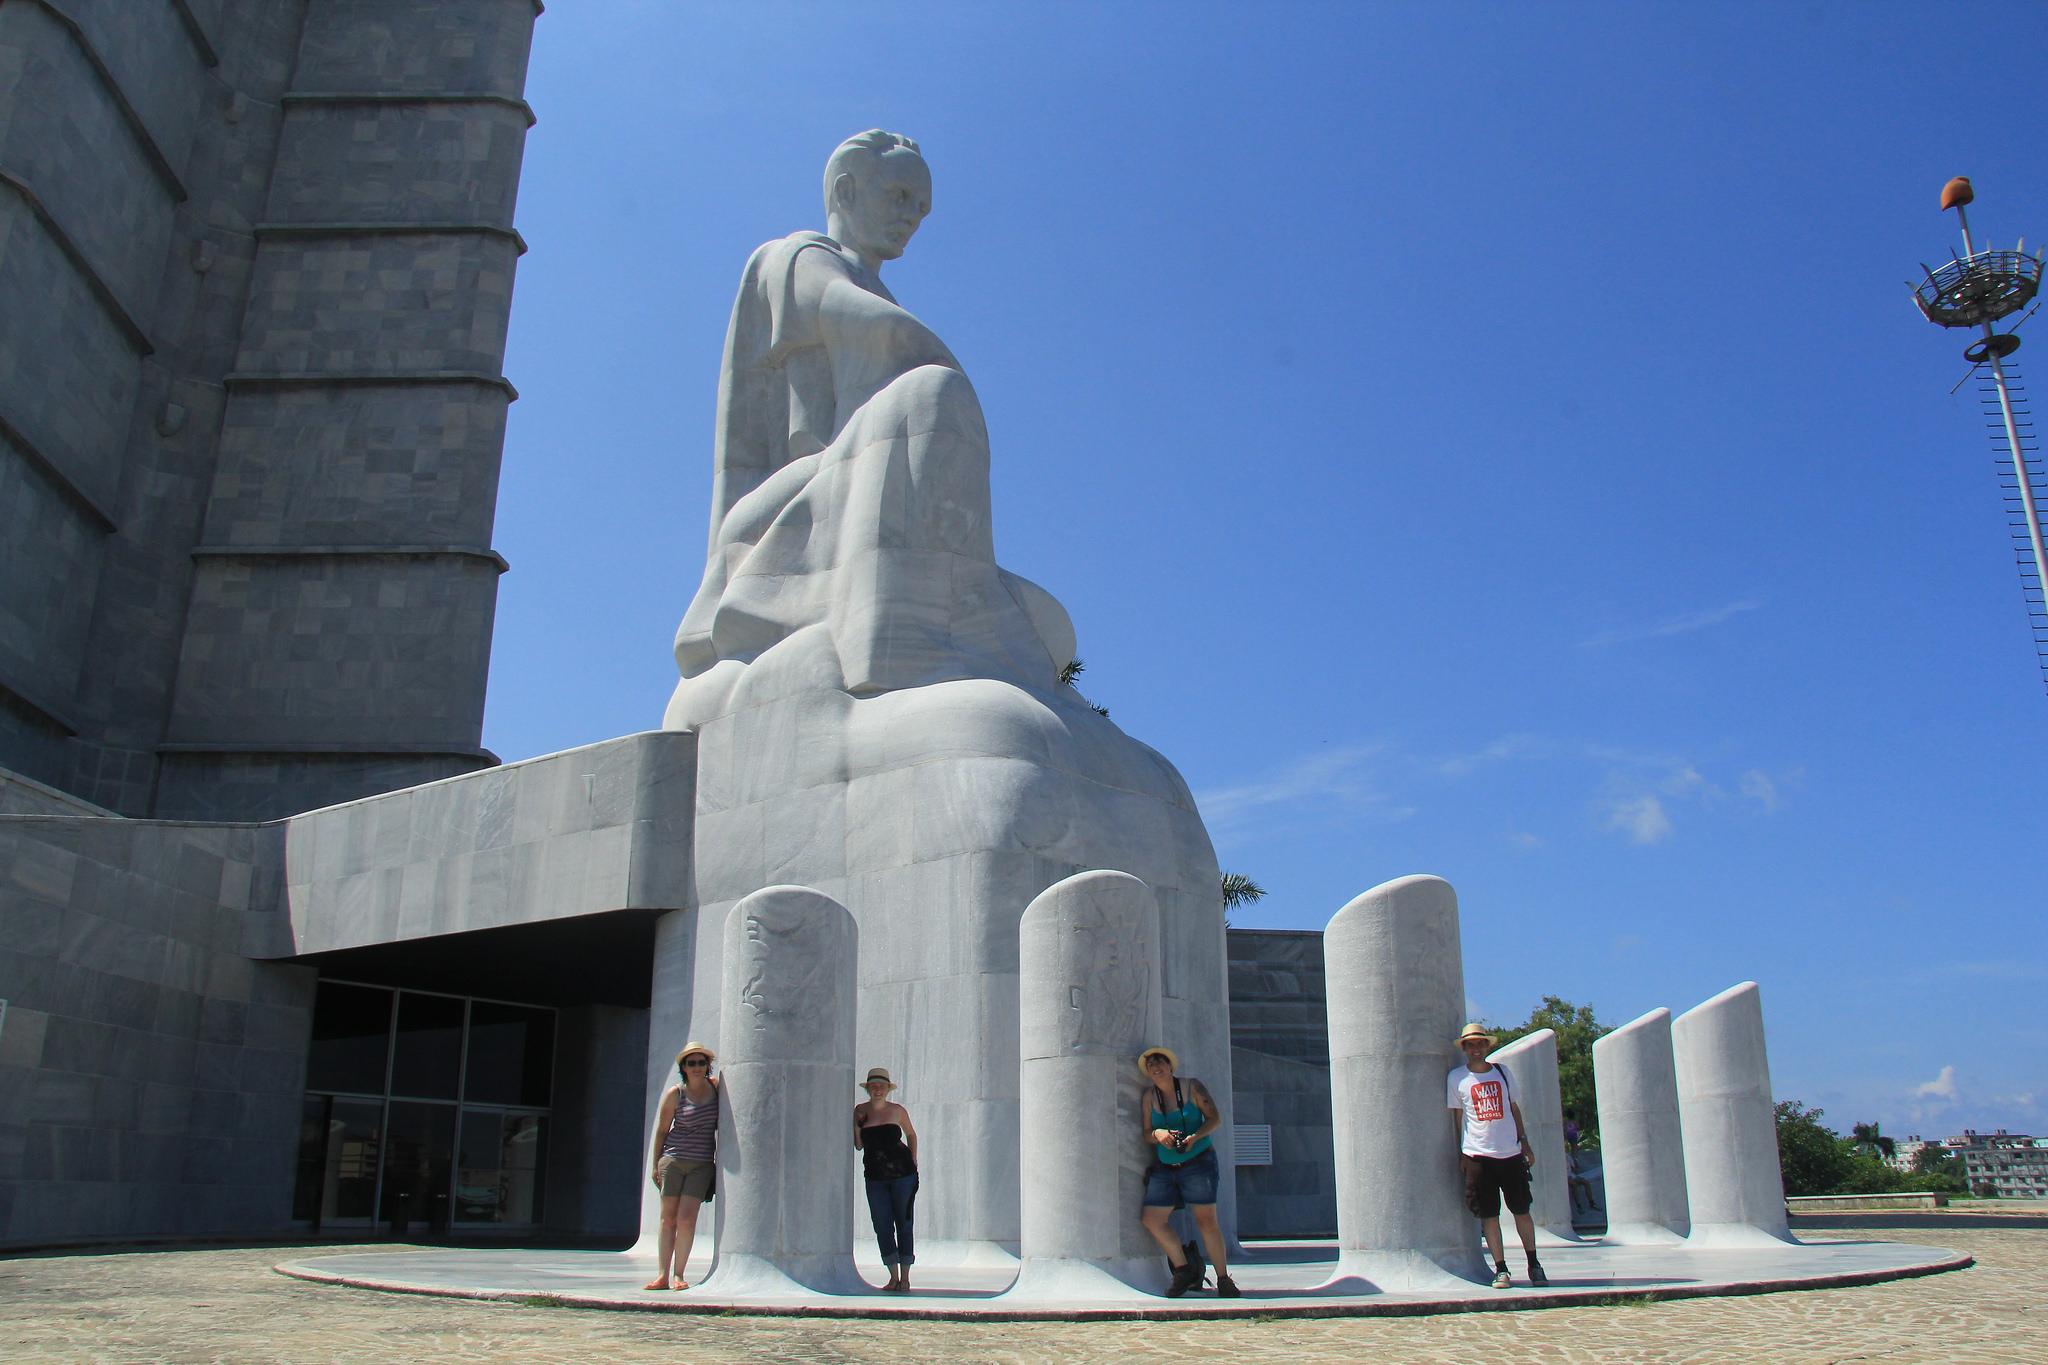 Площадь Революции в Гаване, мемориал Хосе Марти